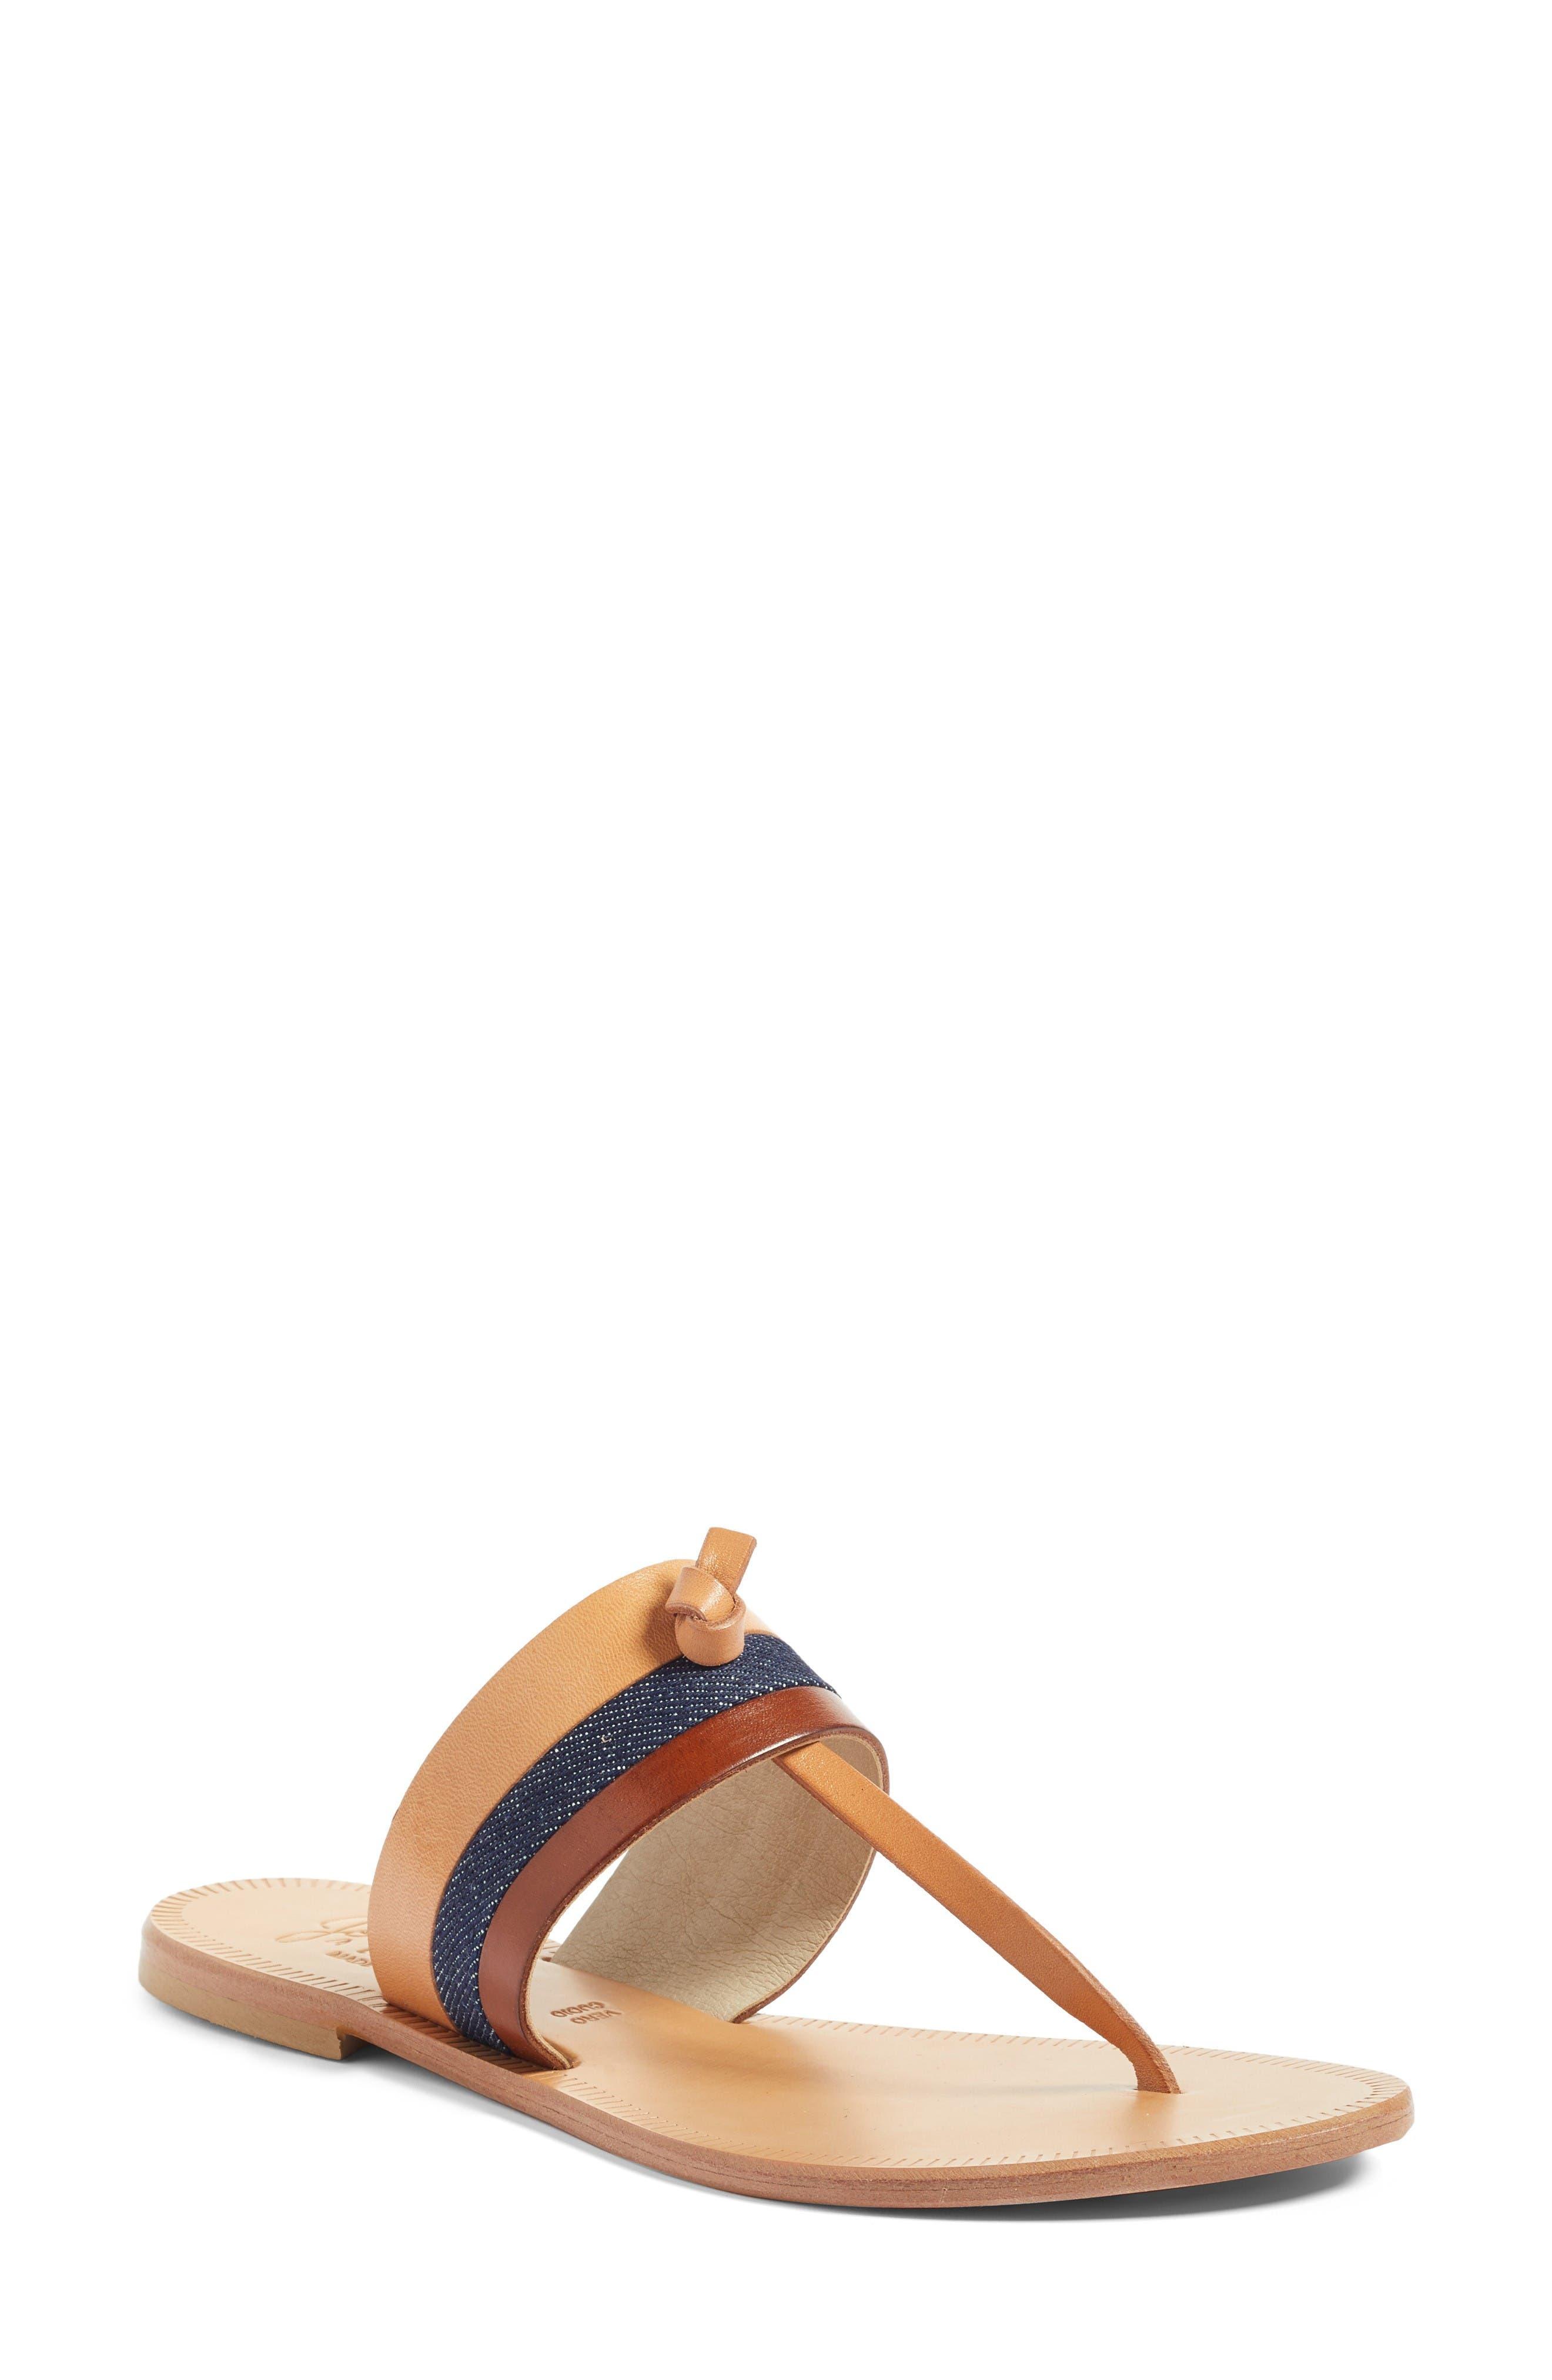 Joie Naima Flip Flop (Women)